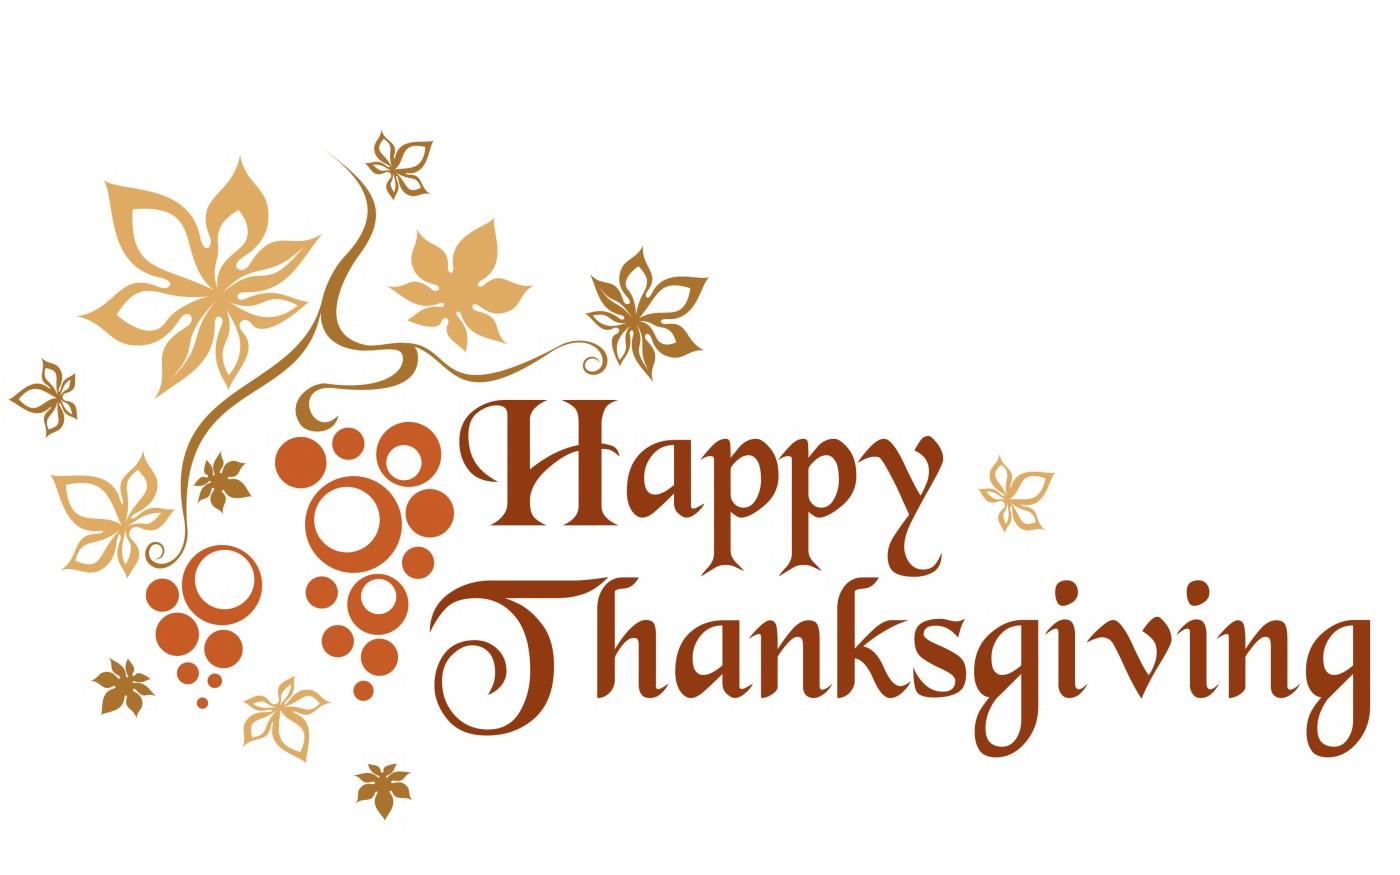 Happy thanksgiving everyone transblue happy thanksgiving everyone kristyandbryce Image collections